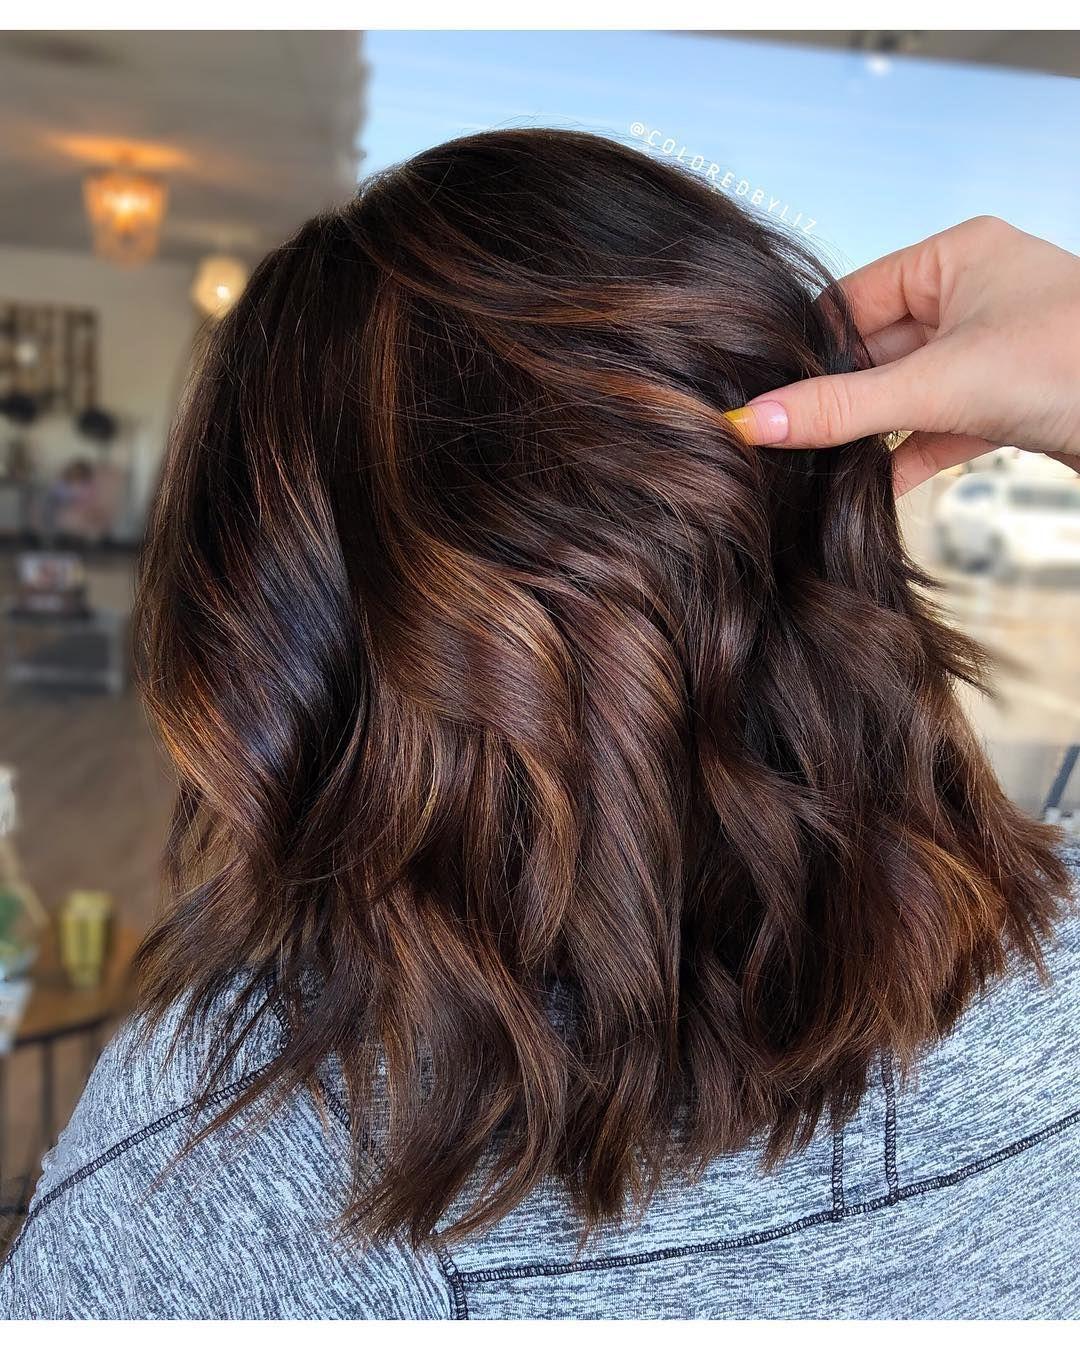 Frühlings-Haarfarbentrend: Chocolate Cake Hair | freundin.de #balayagebrunette